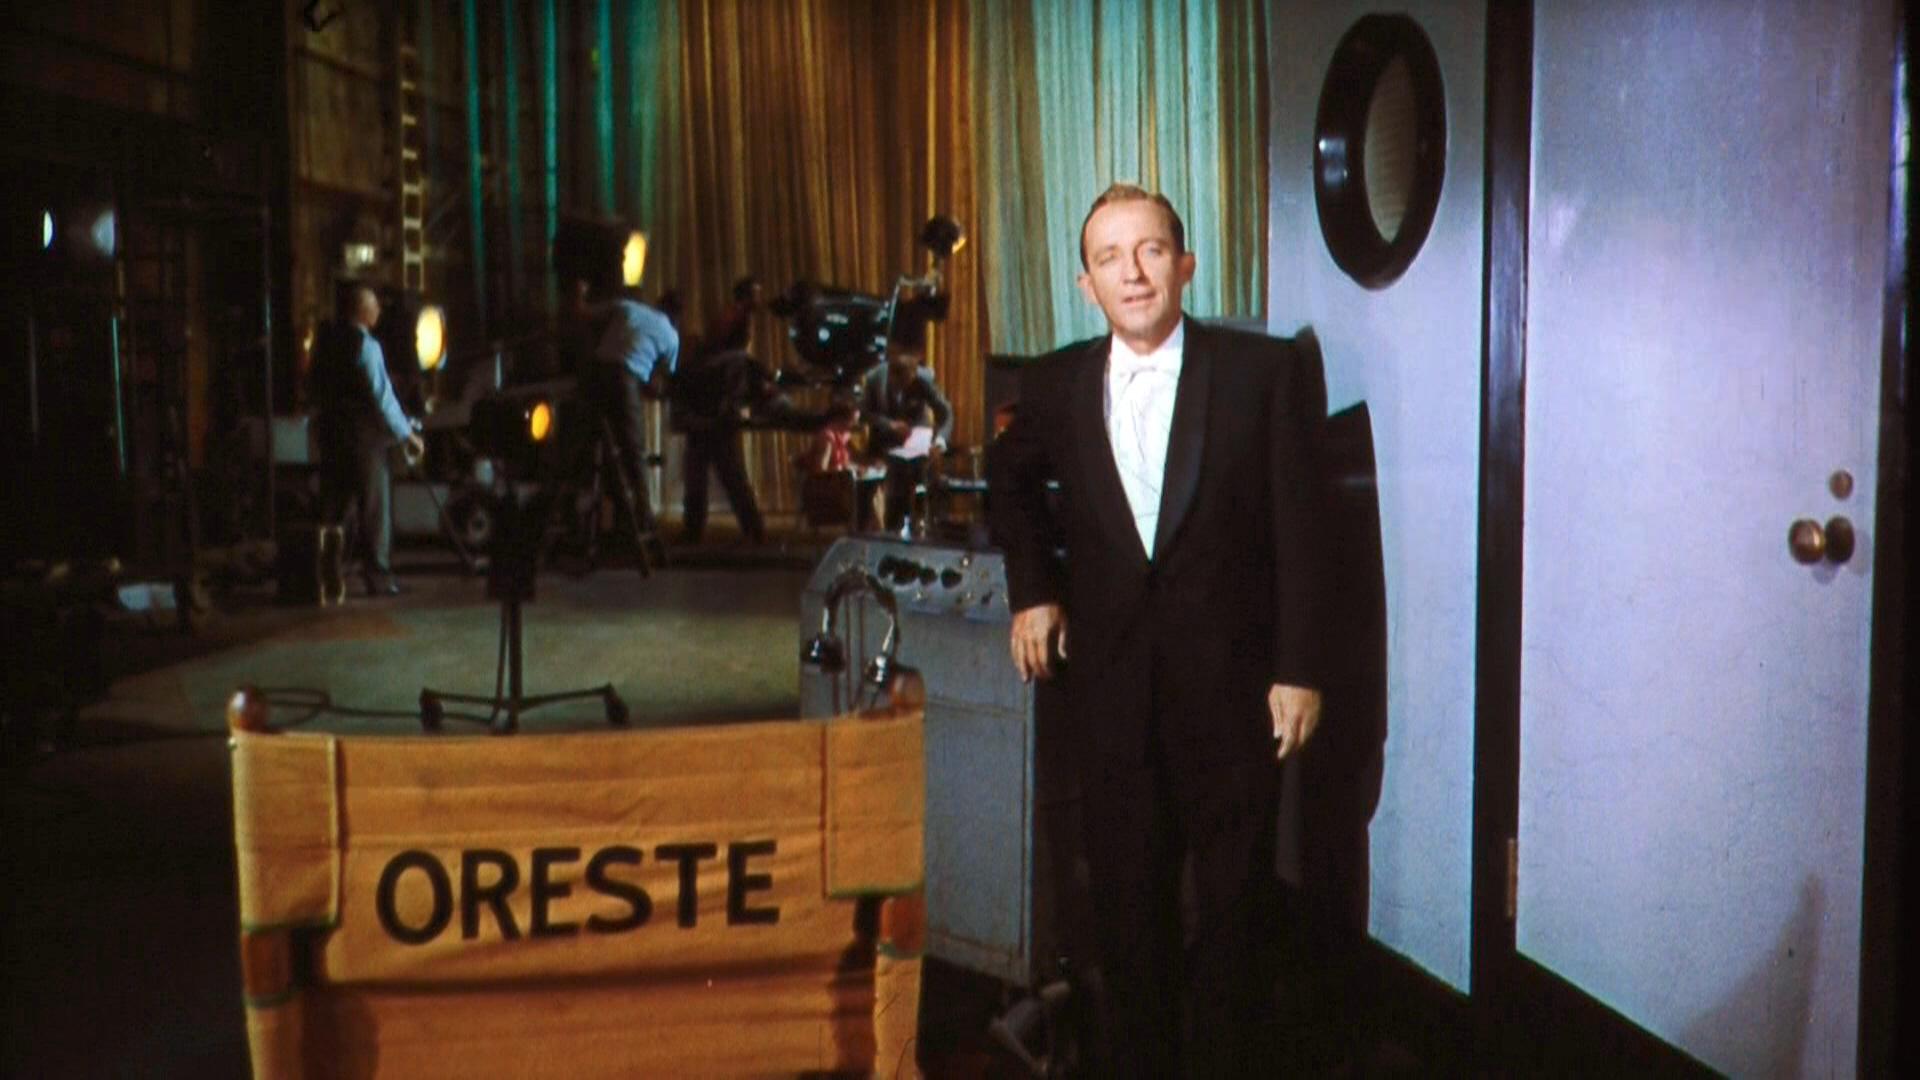 Bing Crosby in Bing Presents Oreste (1956)